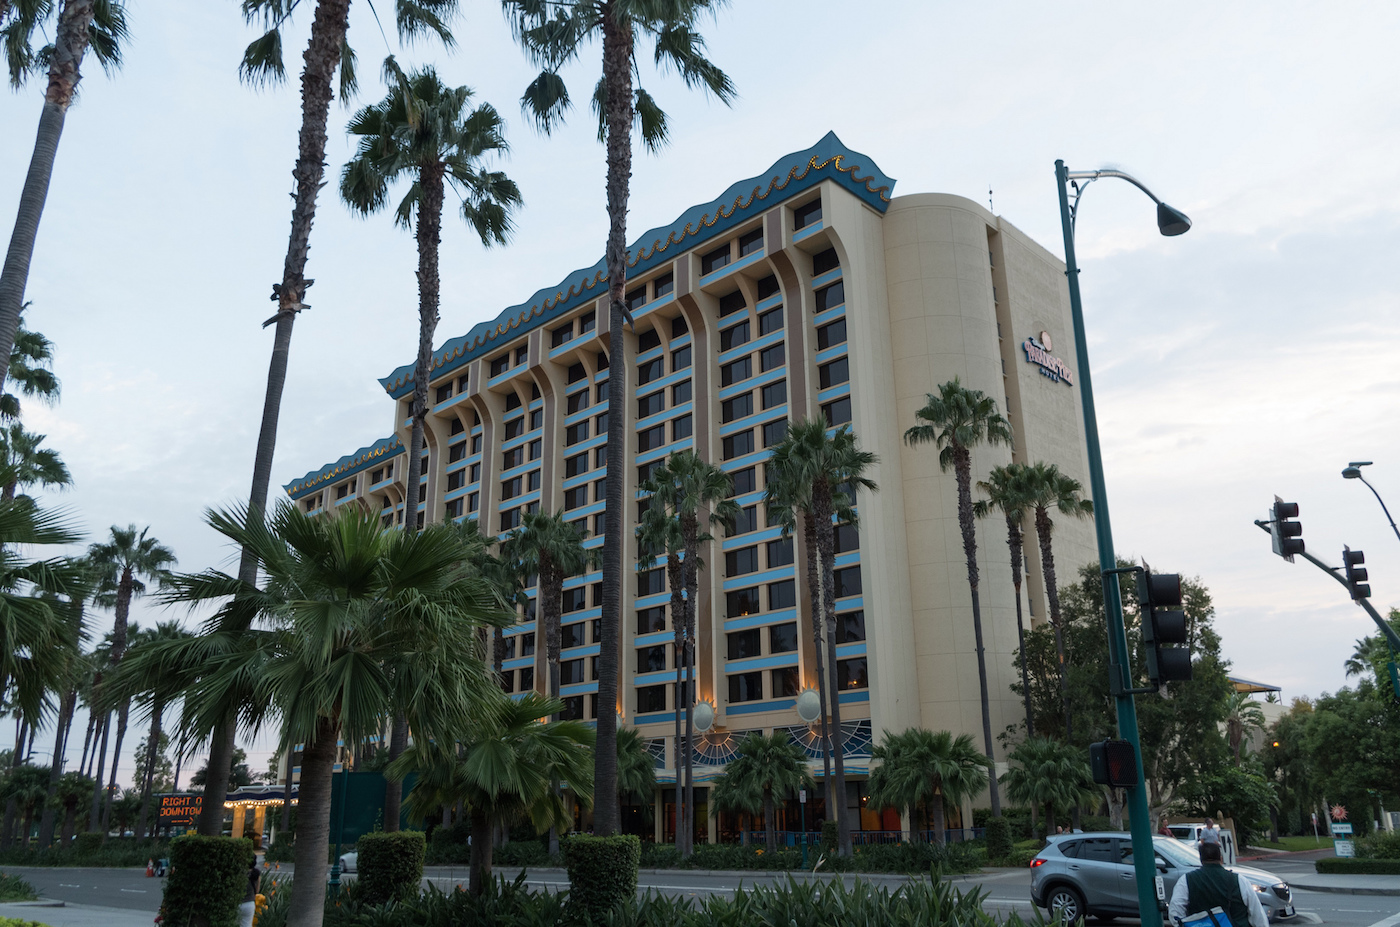 Hotels Near Disneyland California With Kitchen